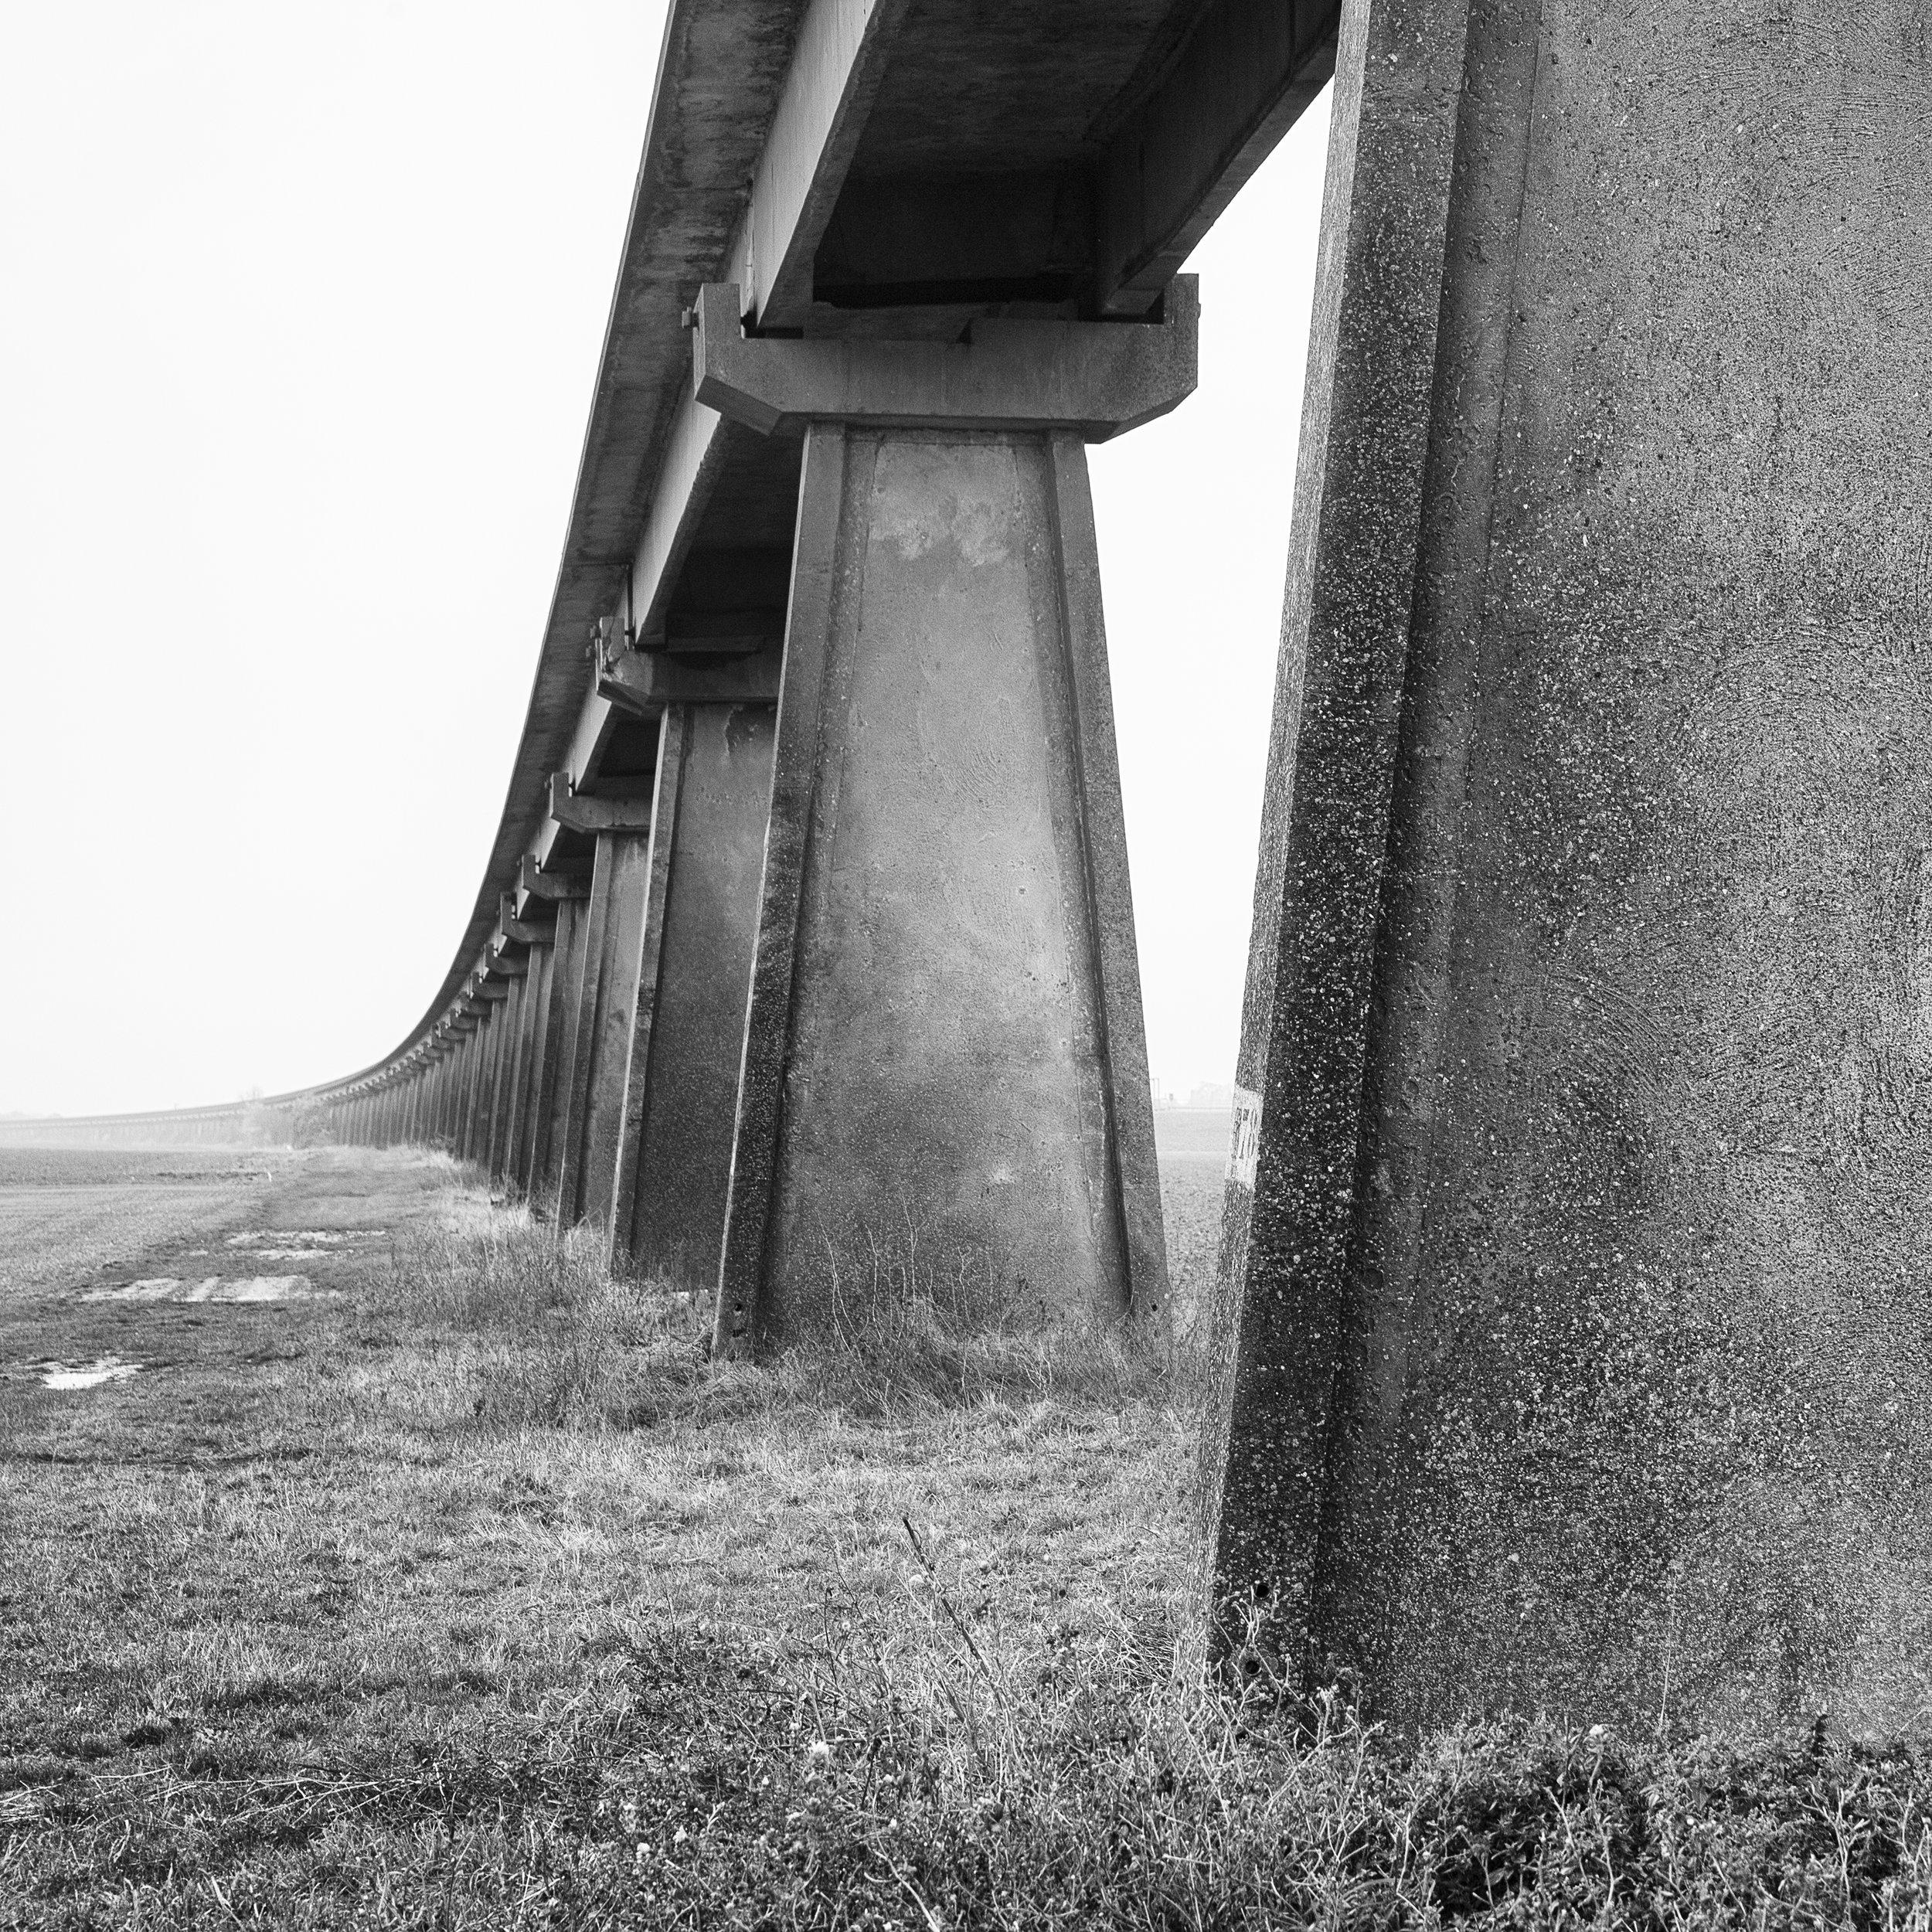 4 Viaduc, pilier 778